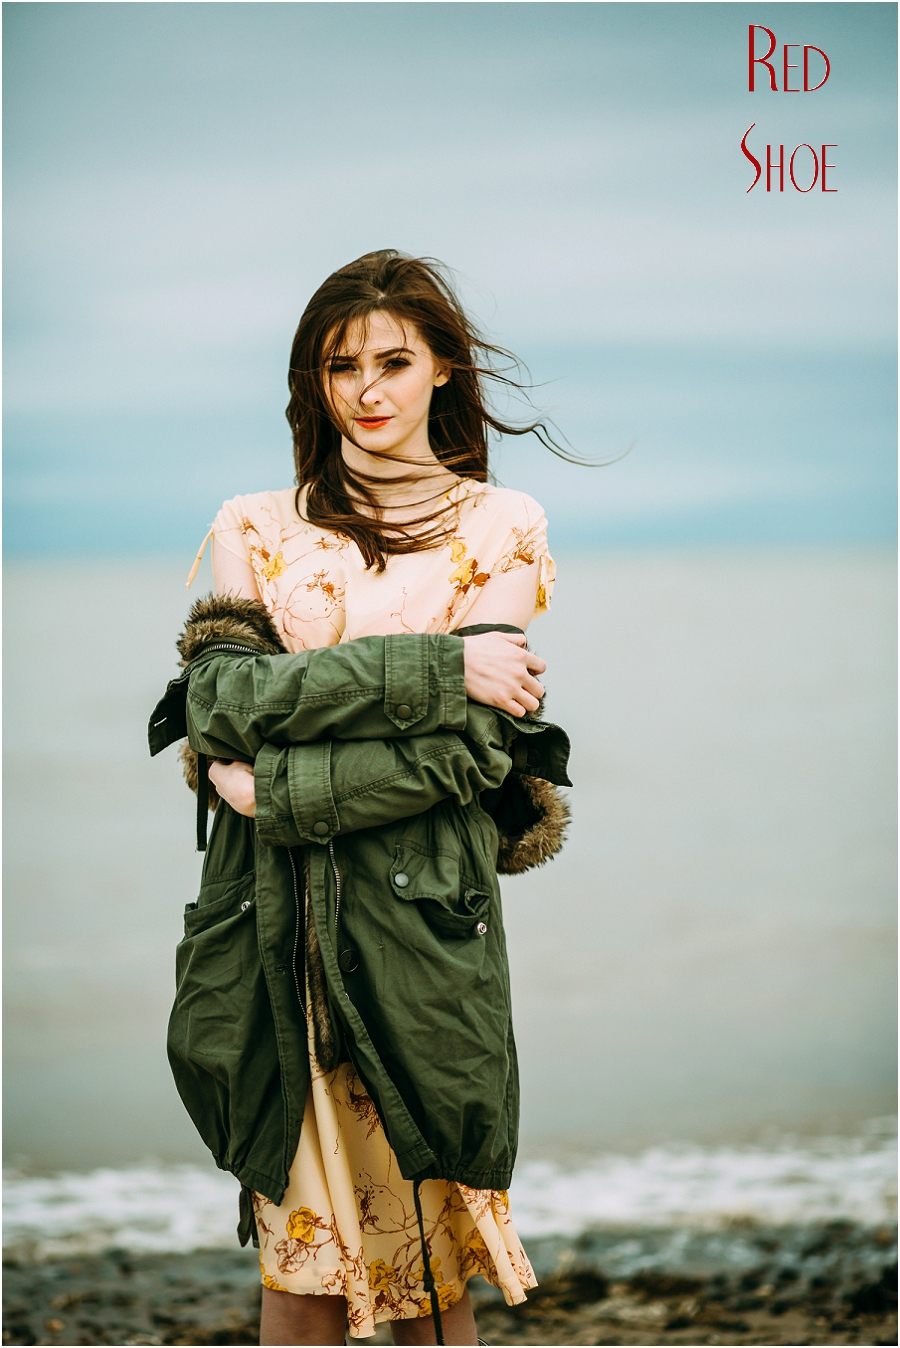 Red Shoe Photography, Beach photo shoot, Fashion, editorial_0031.jpg